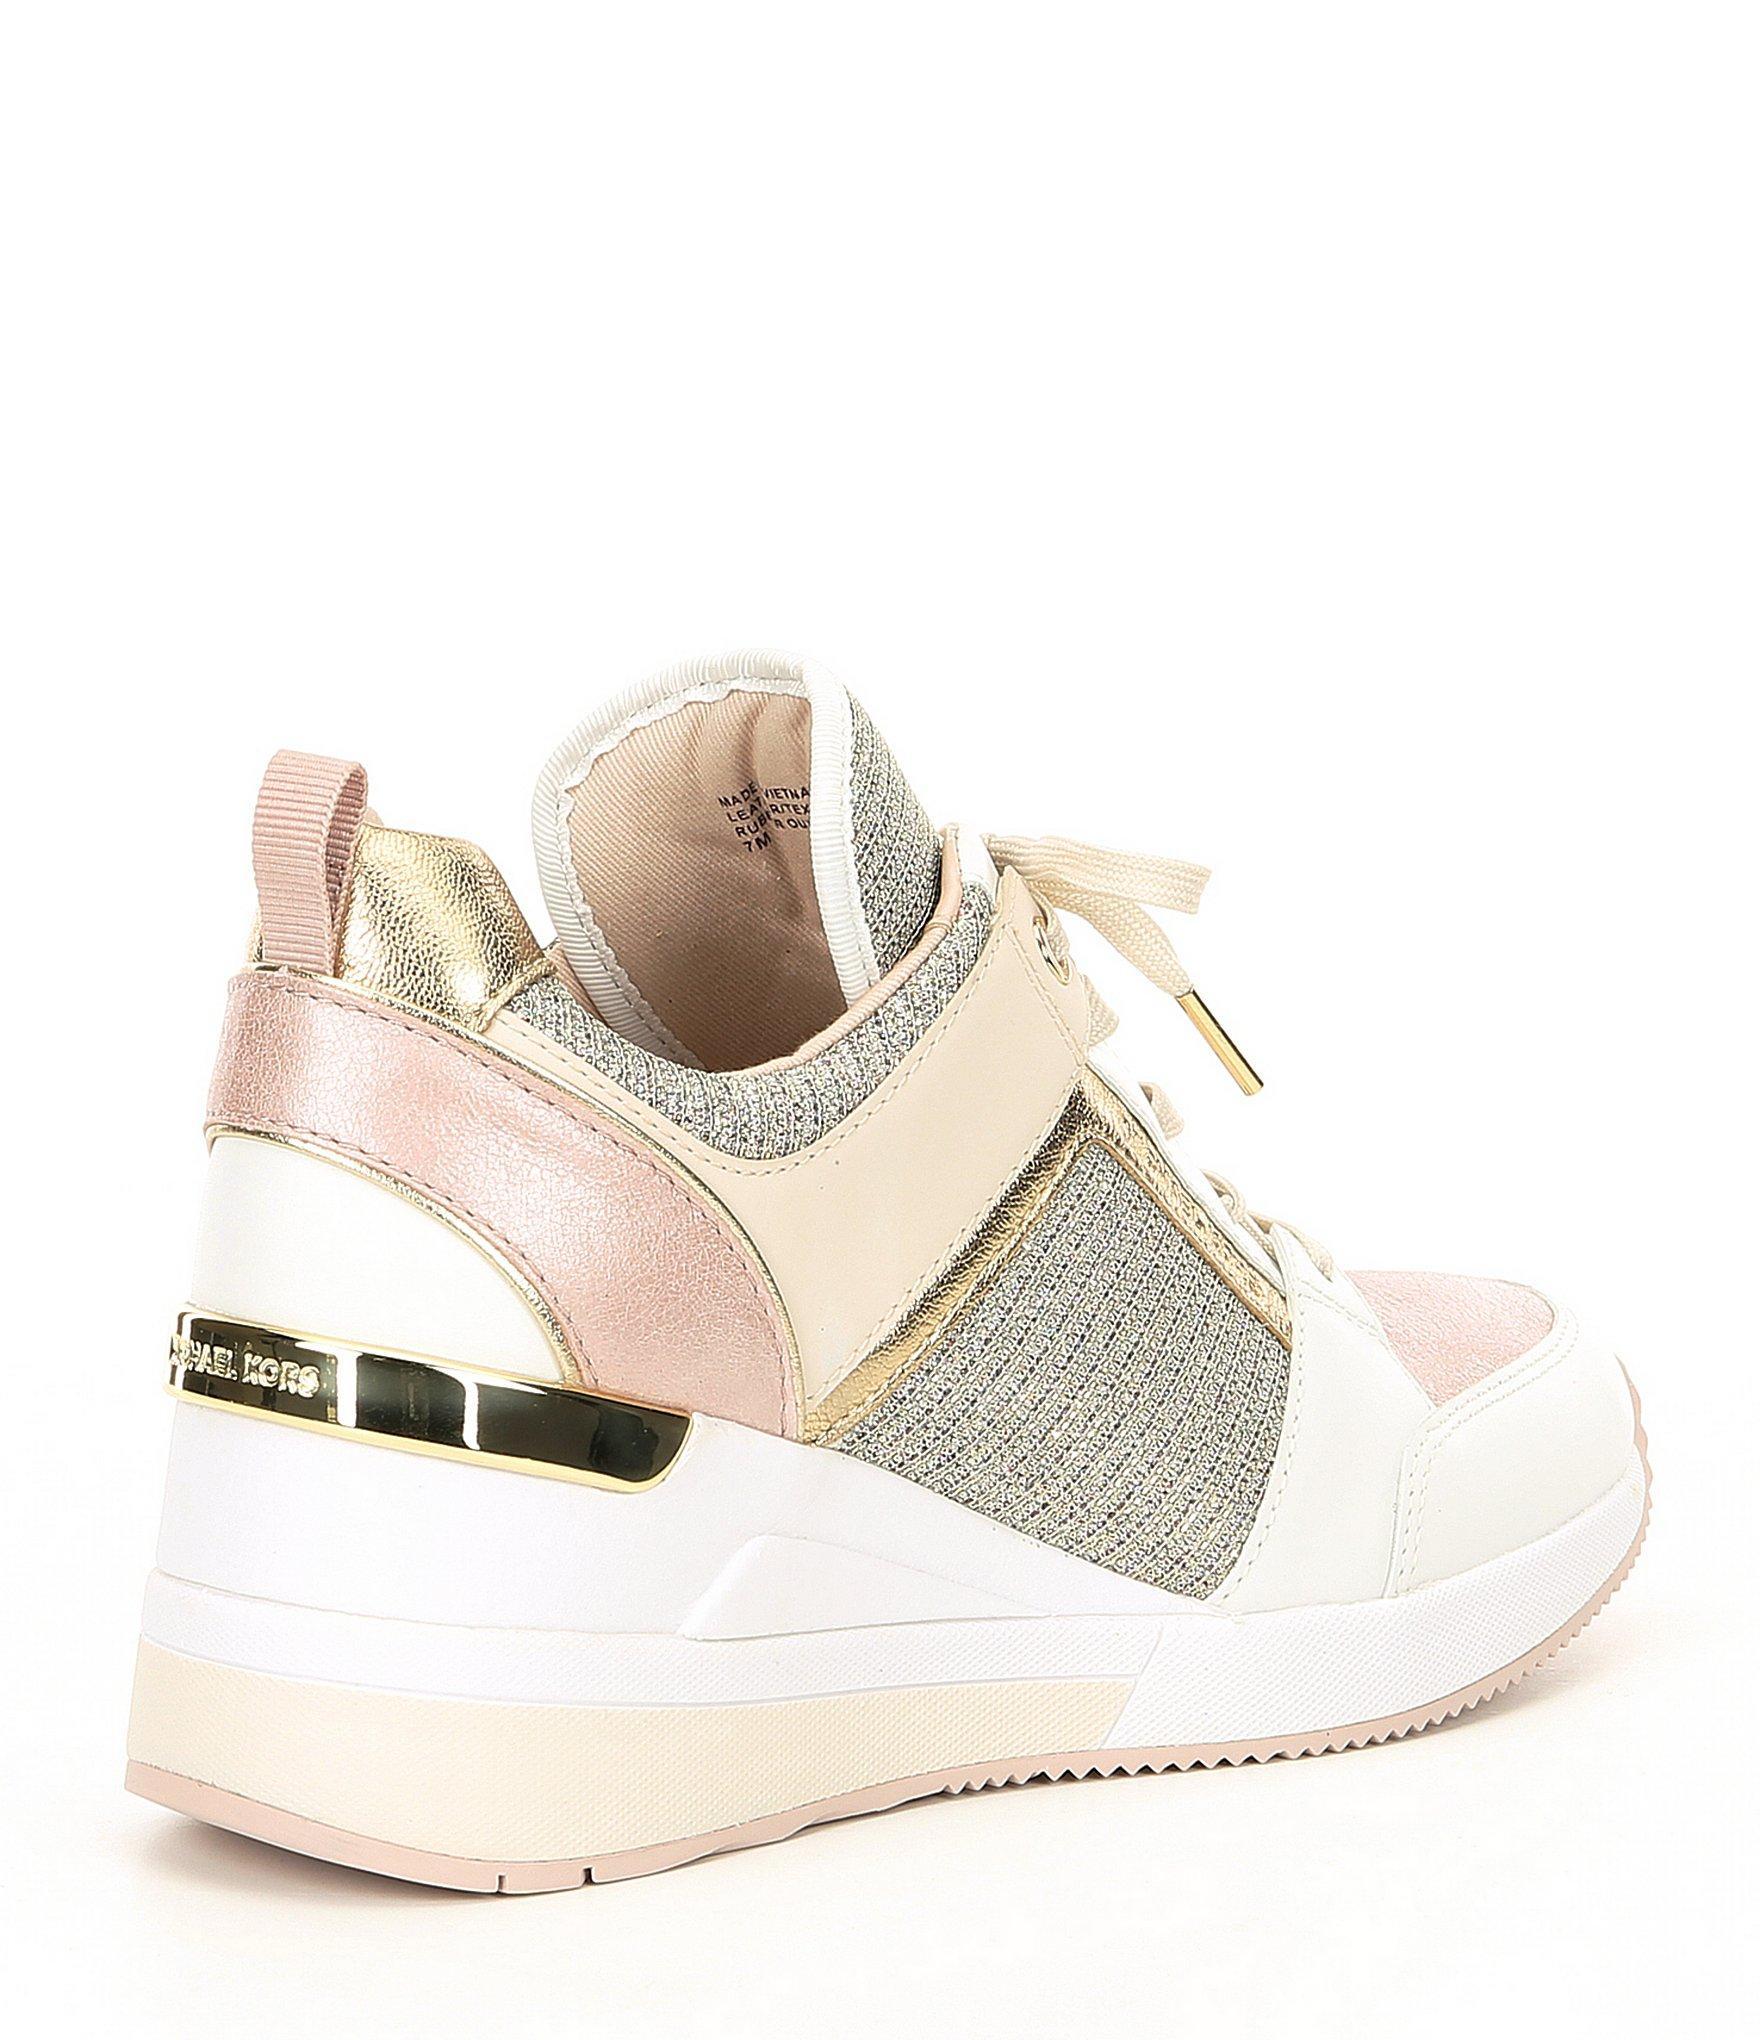 a511e756482 MICHAEL Michael Kors - Pink Georgie Leather   Glitter Fabric Wedge Trainers  - Lyst. View fullscreen